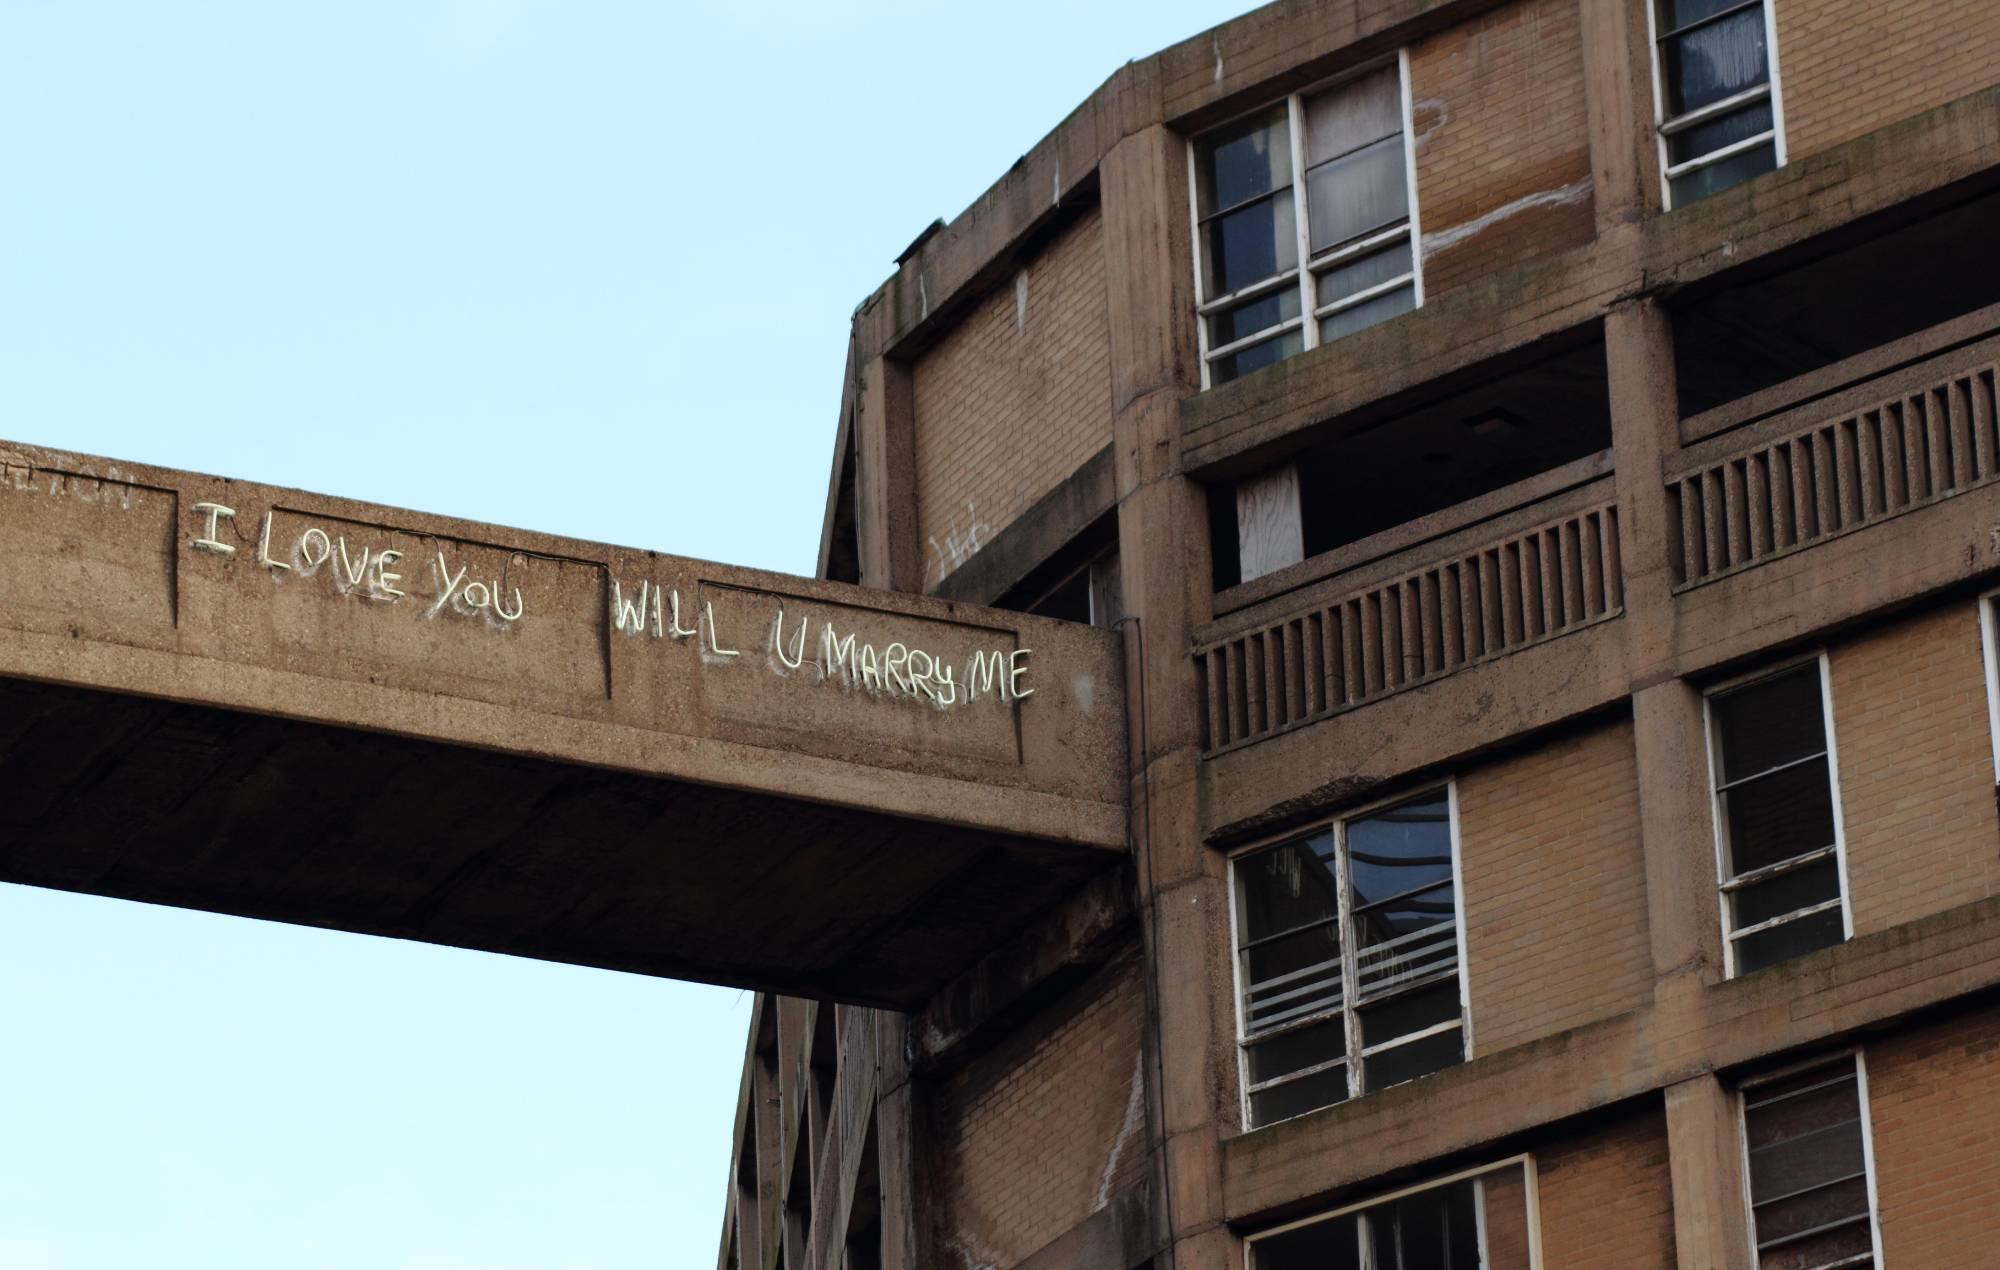 Graffiti based artwork adorns a bridge on the Park Hill housing estate, Sheffield Yorkshire UK Contributor: Matthew Taylor / Alamy Stock Photo